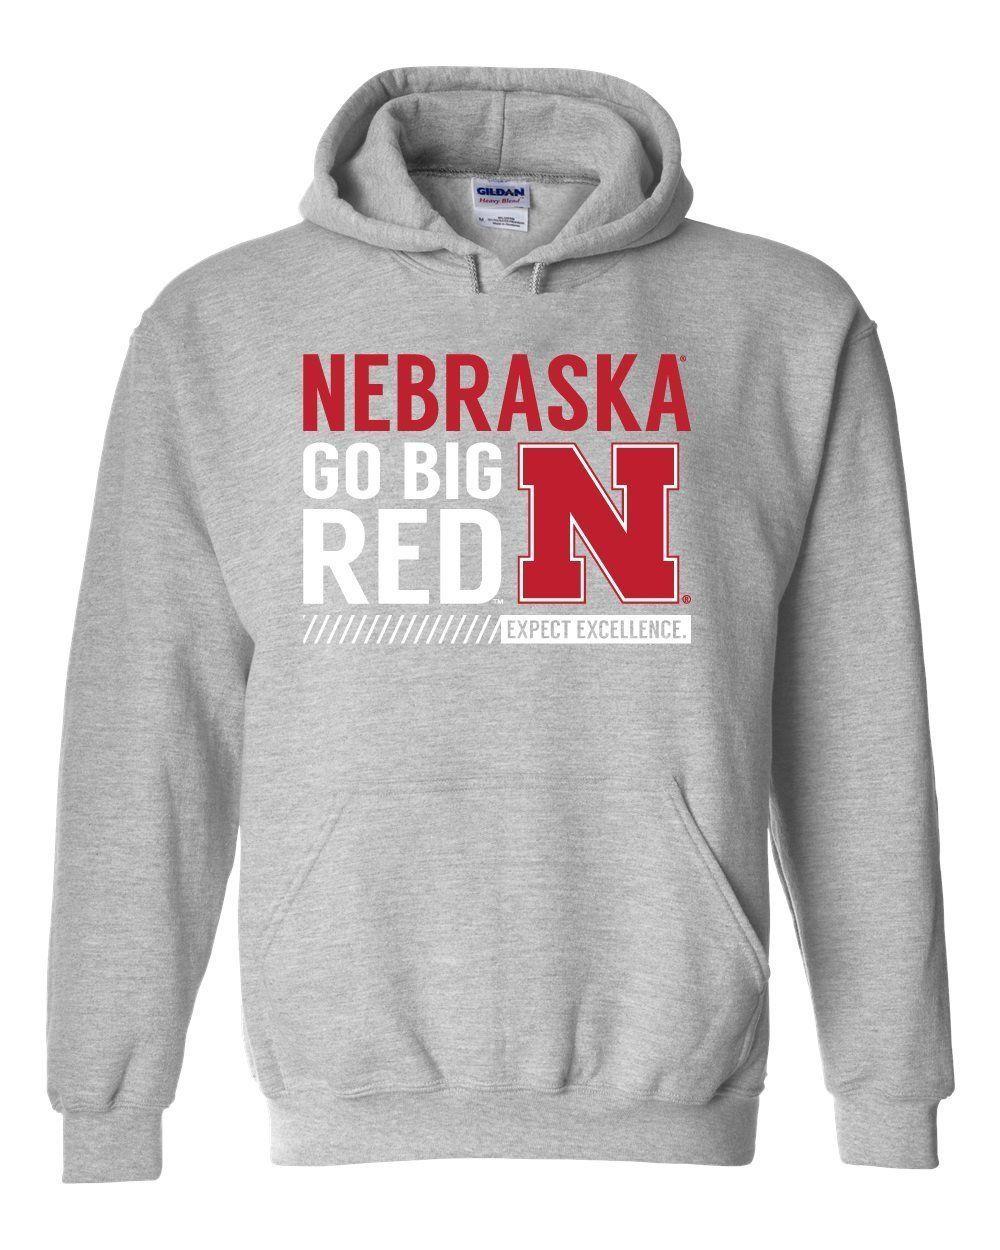 Nebraska Cornhuskers In 2021 Mens Sweatshirts Hoodie Hoodies Men Hoodies [ 1250 x 1000 Pixel ]